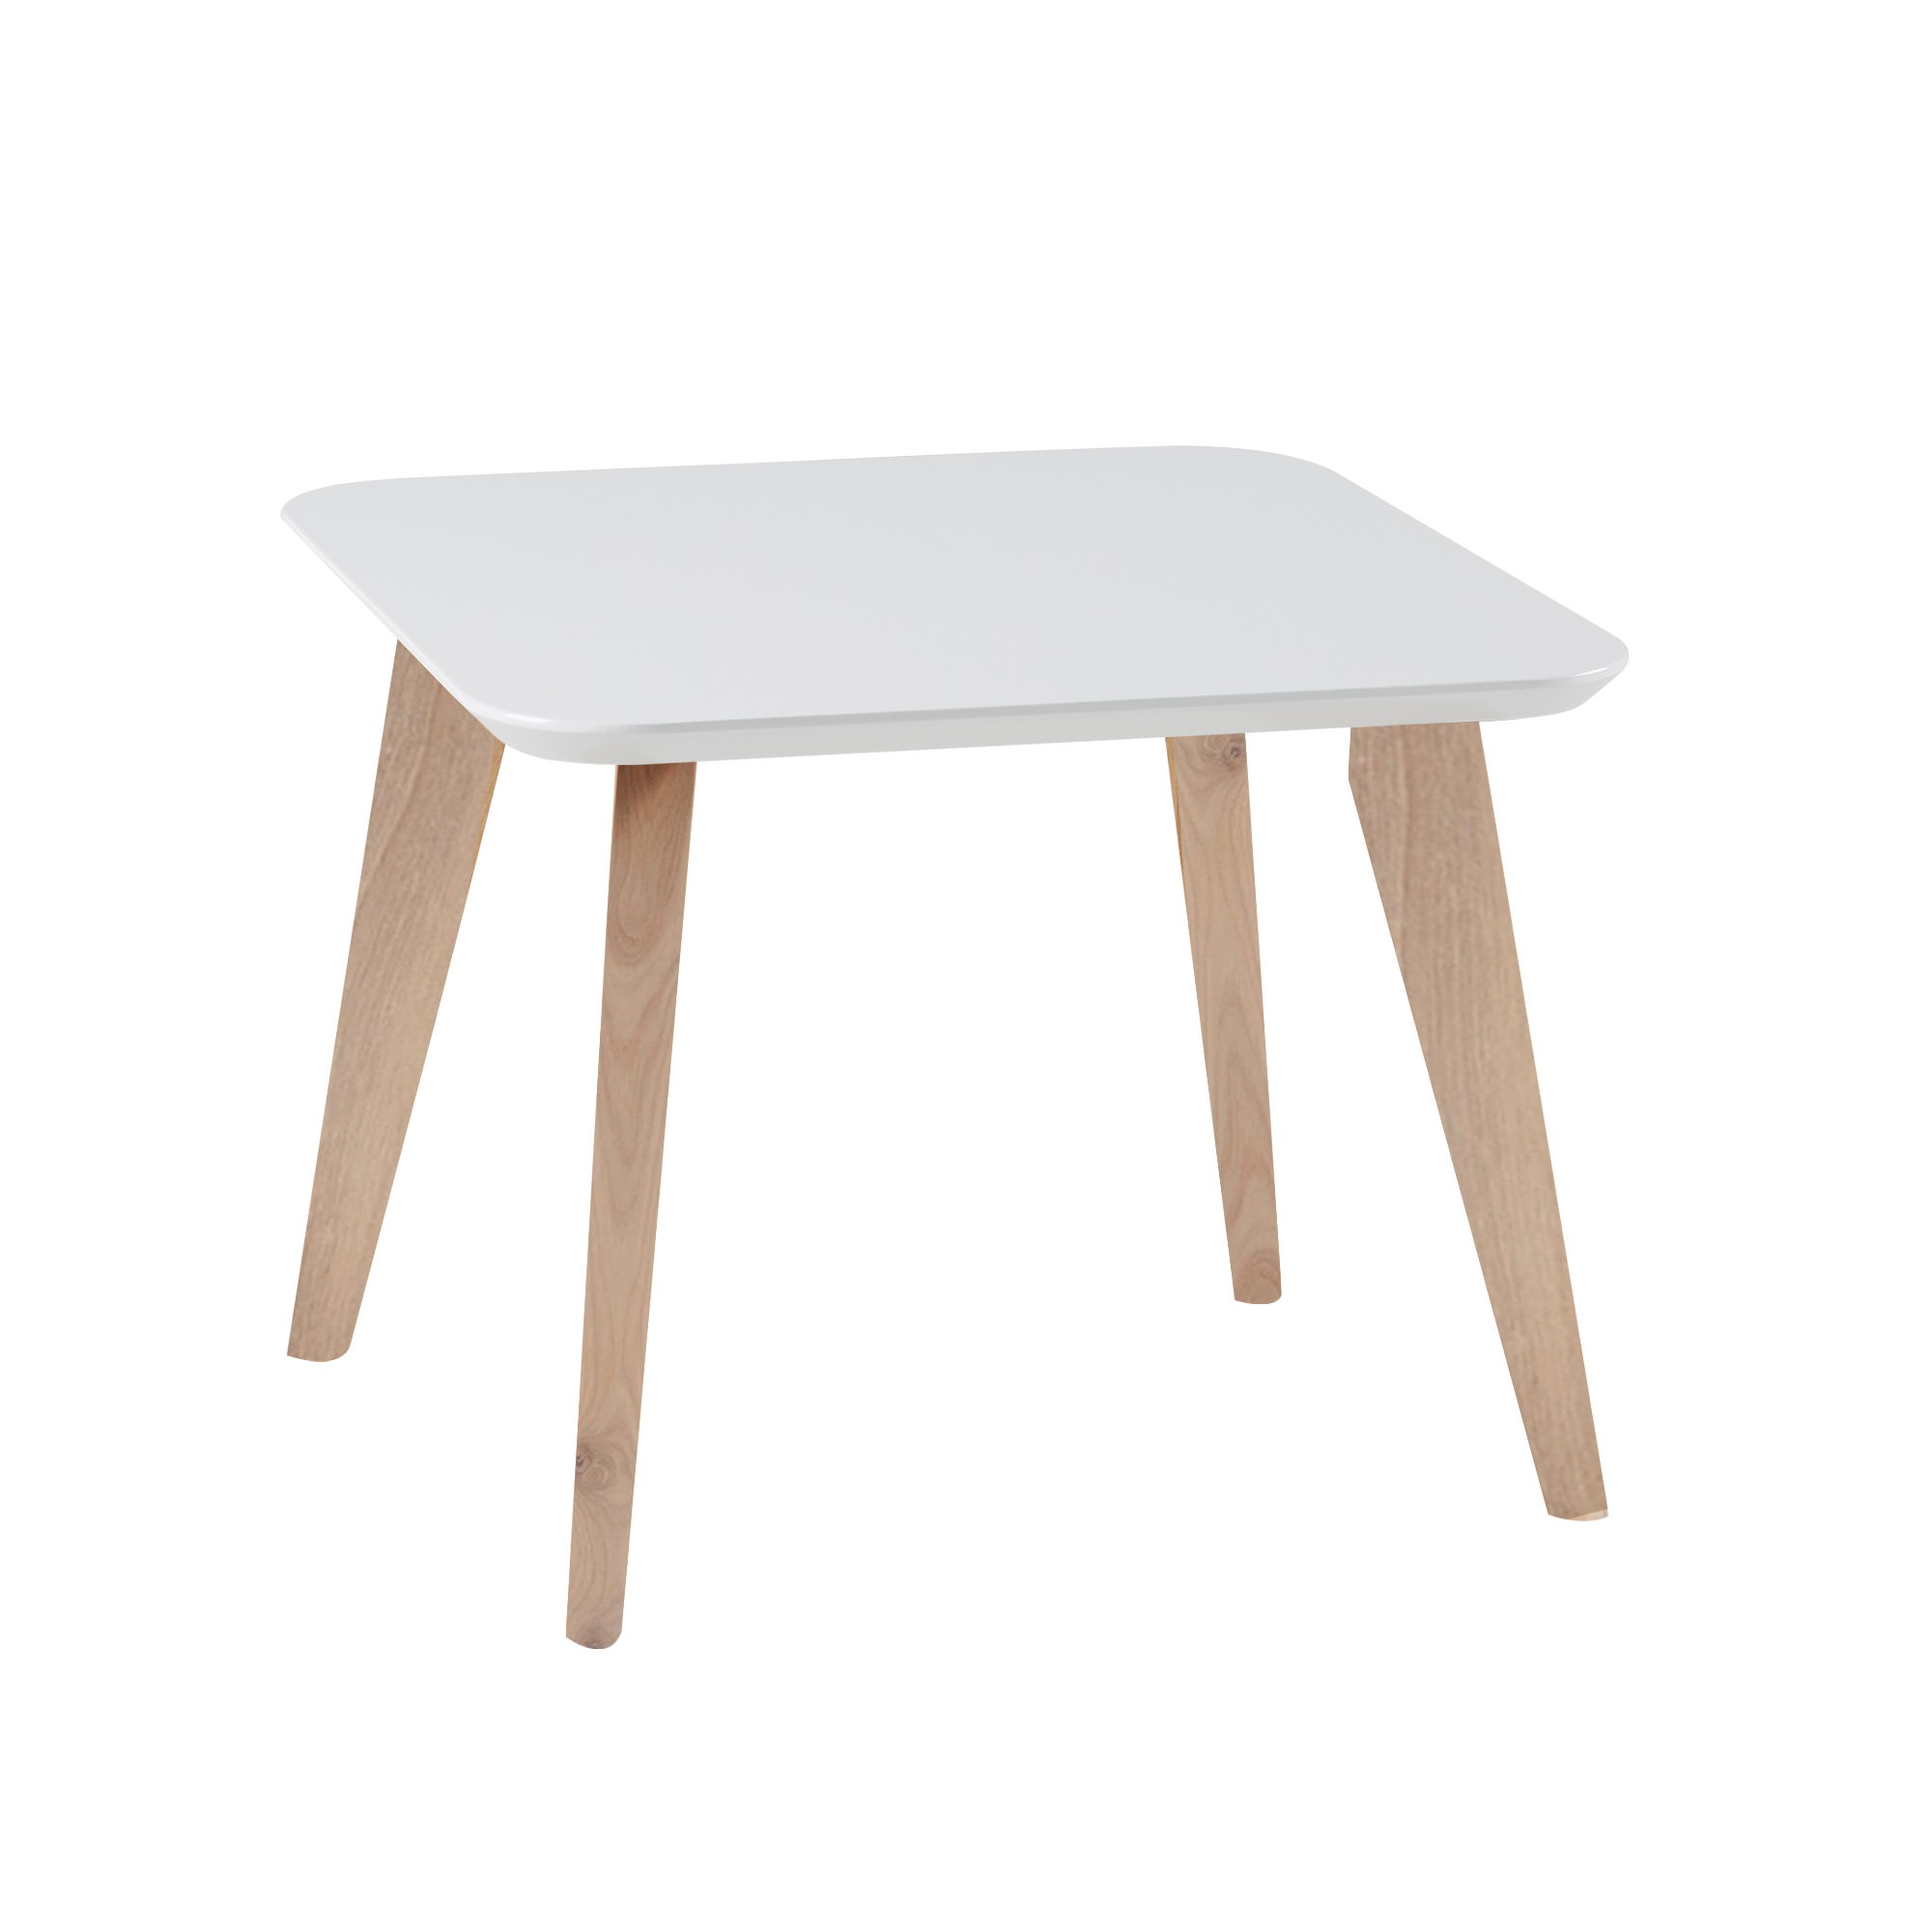 Alexandria Square Lamp Table, White Top